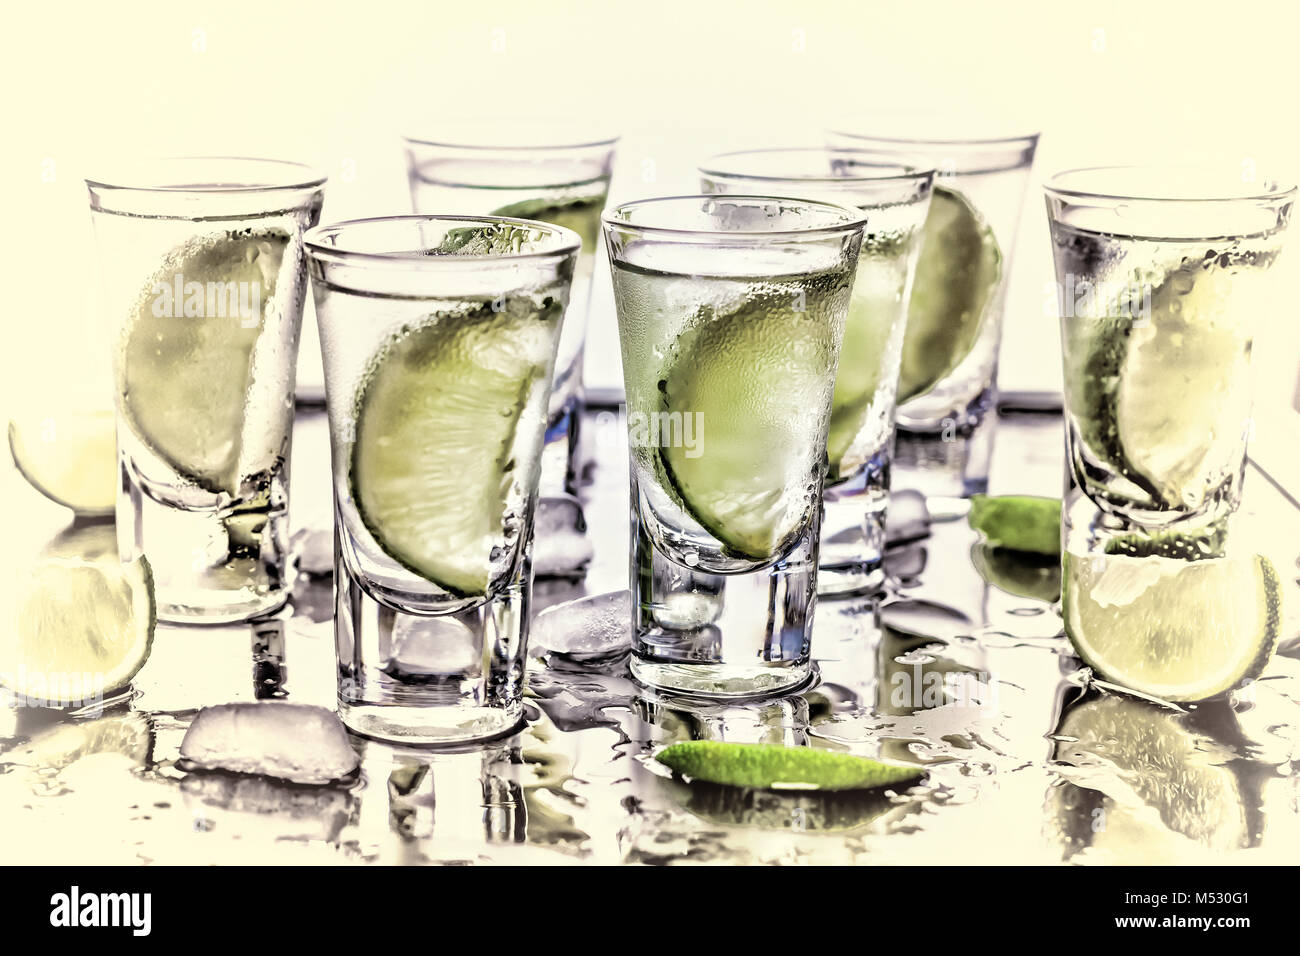 El enfoque selectivo. Gin Tonic con tajadas de limón Imagen De Stock